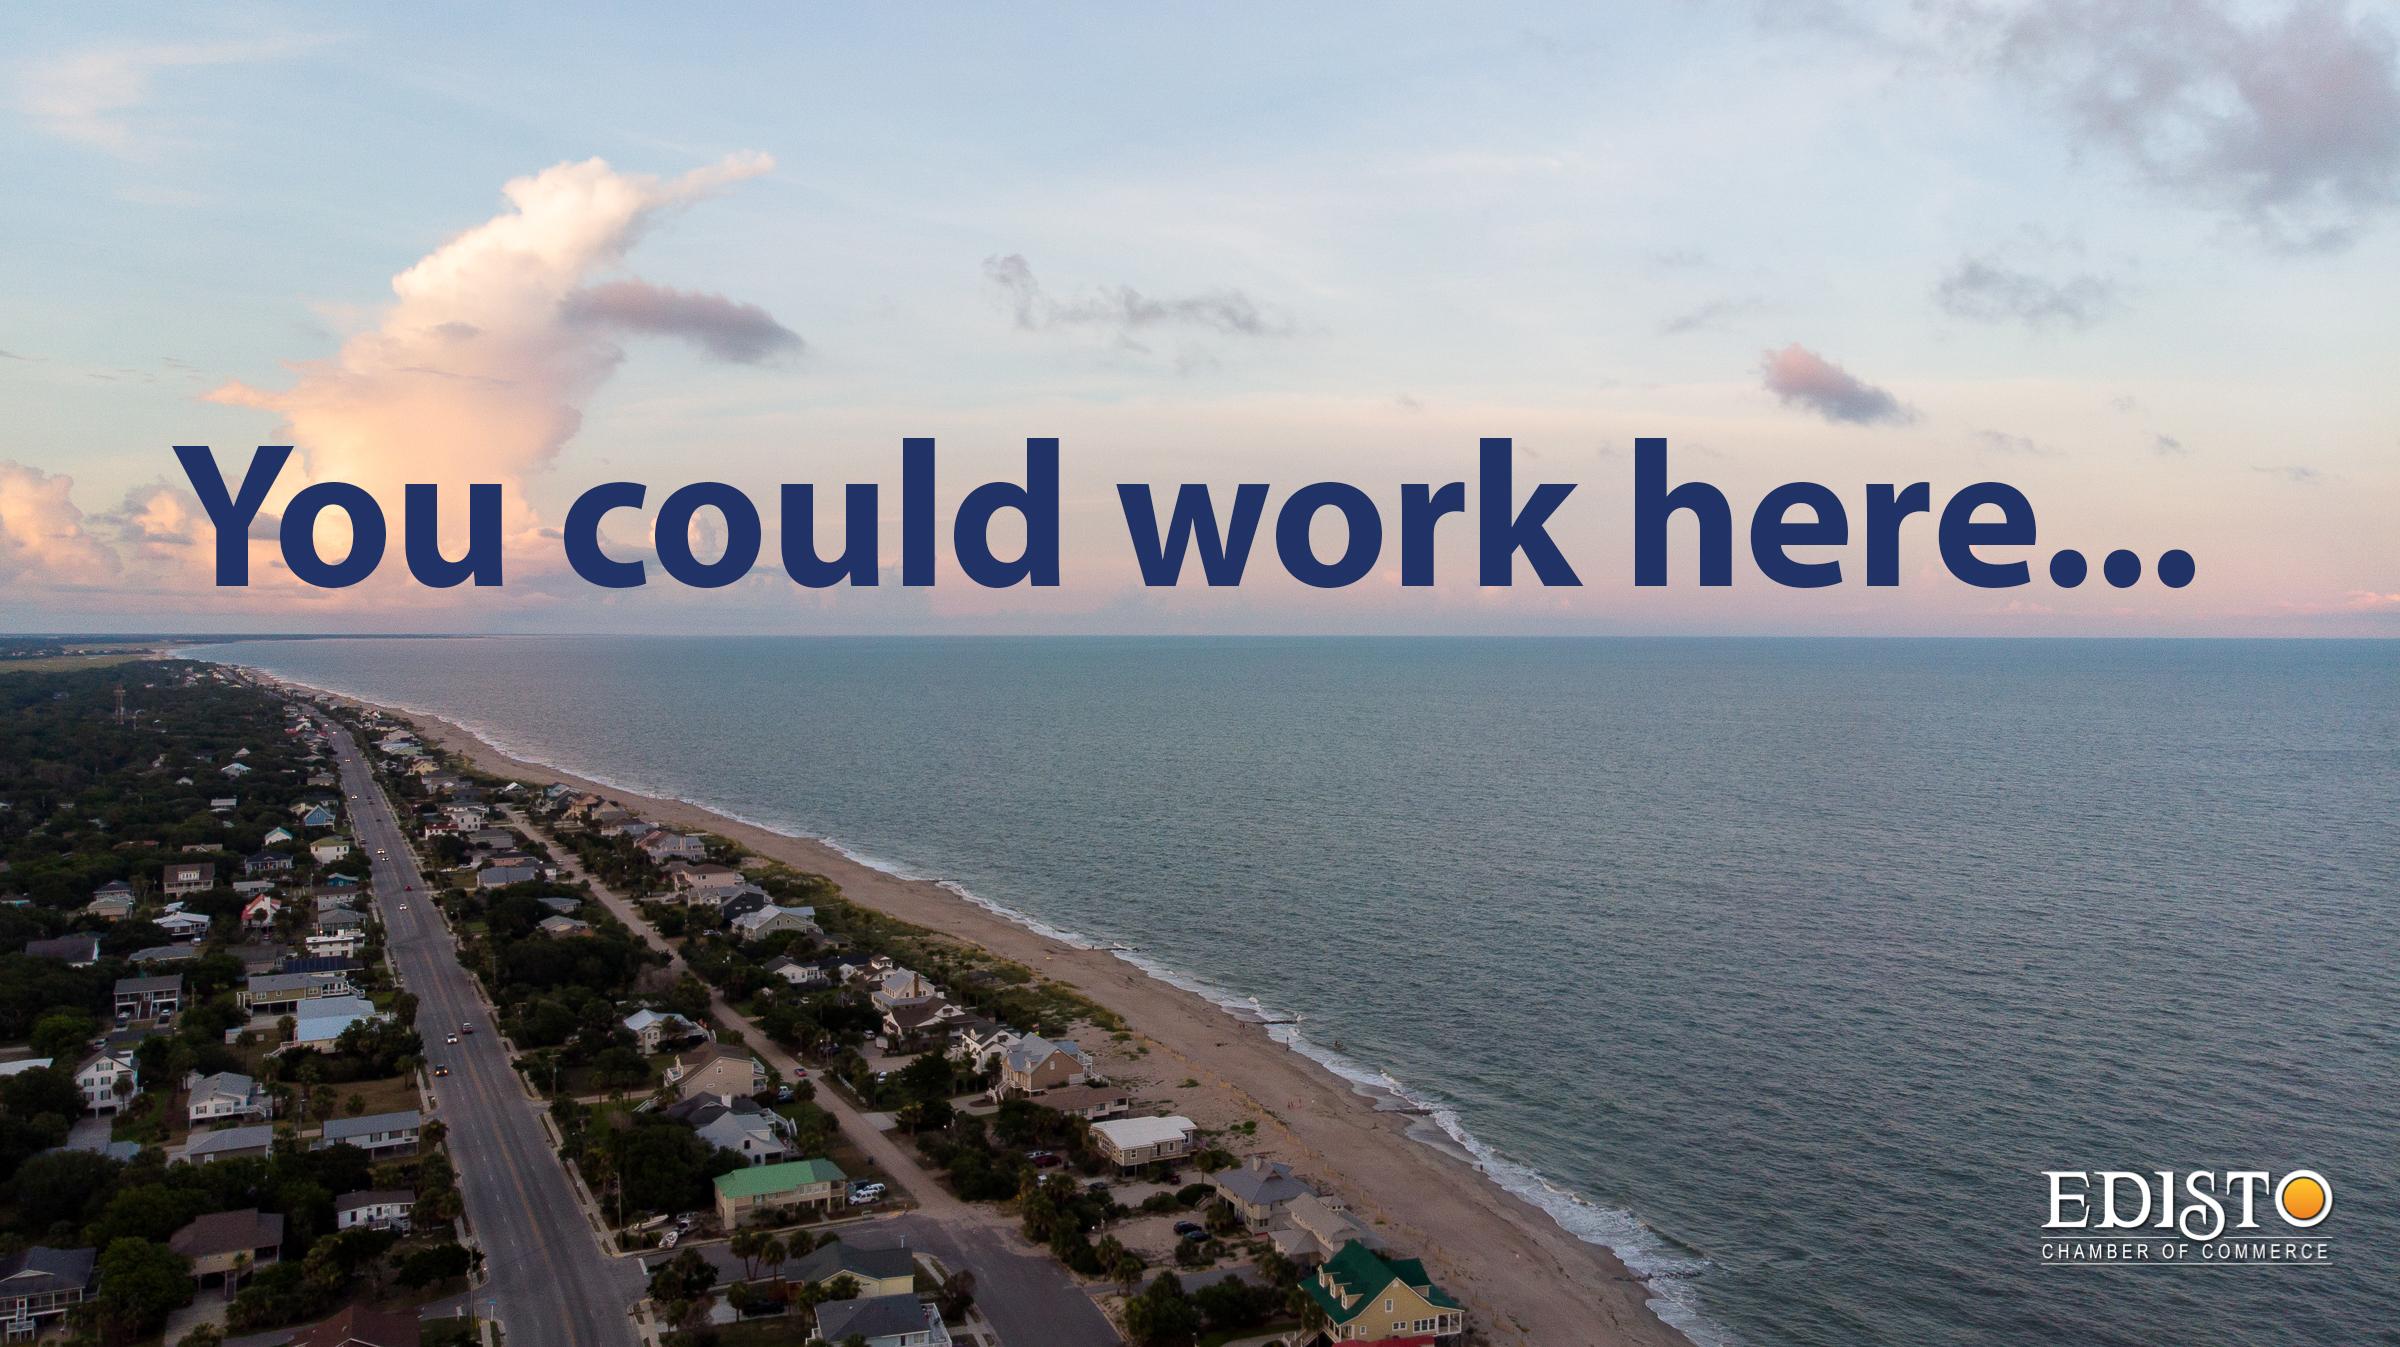 jobs in Edisto South Carolina